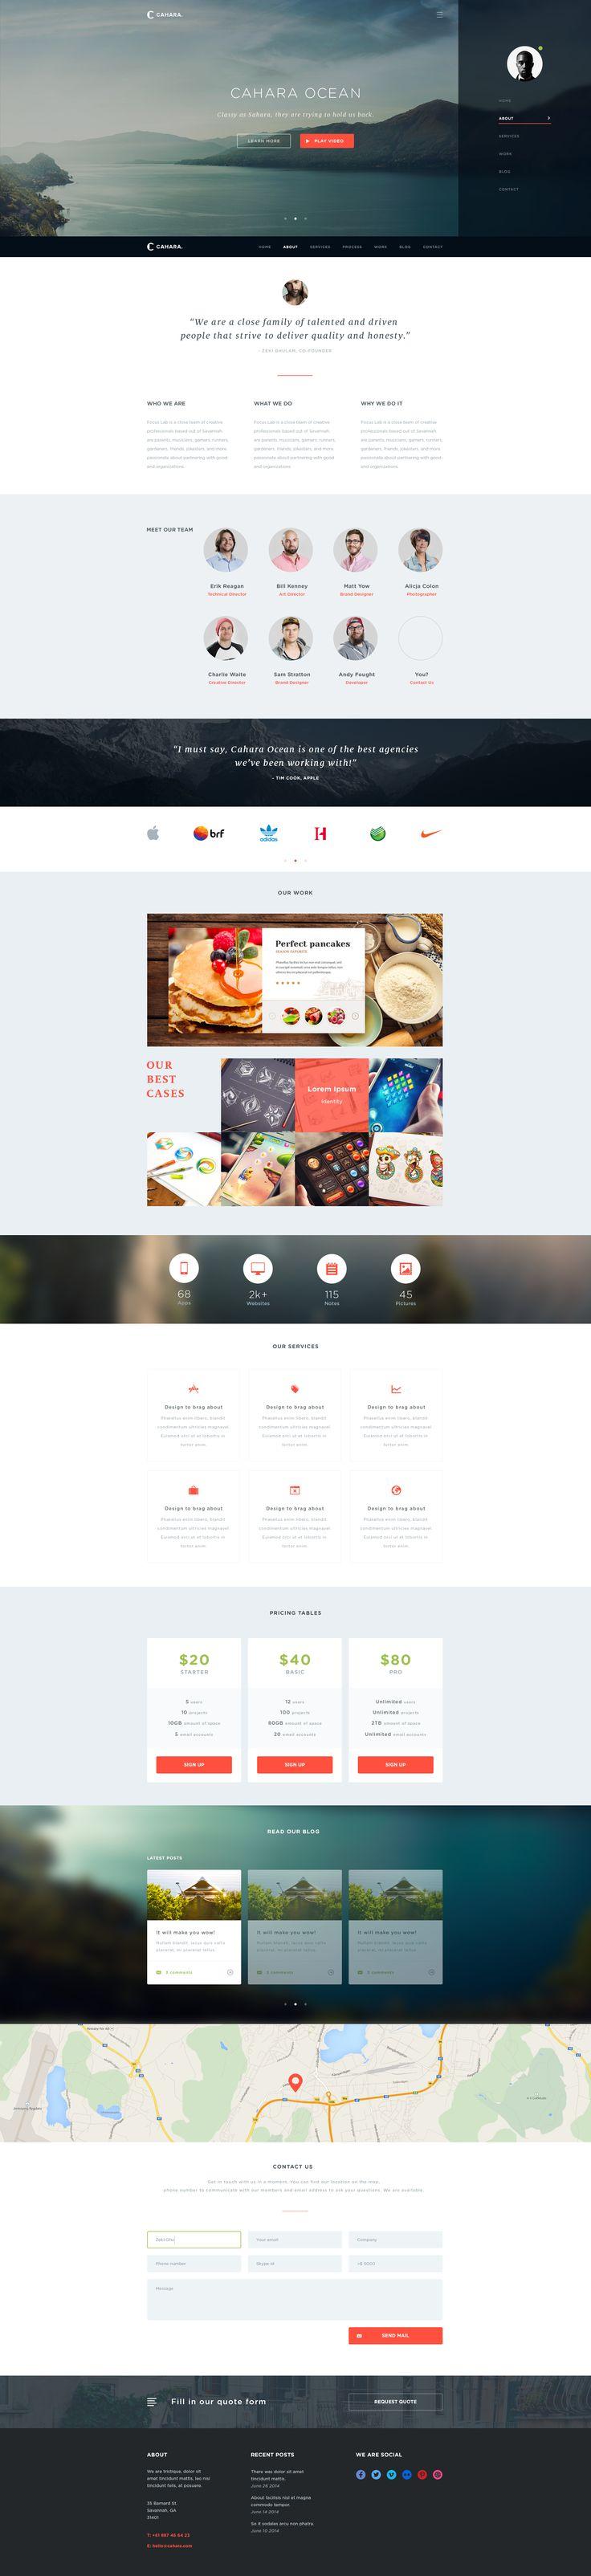 Cahara #webdesign #web #wordpress #minimal #clean #graphicdesign #design